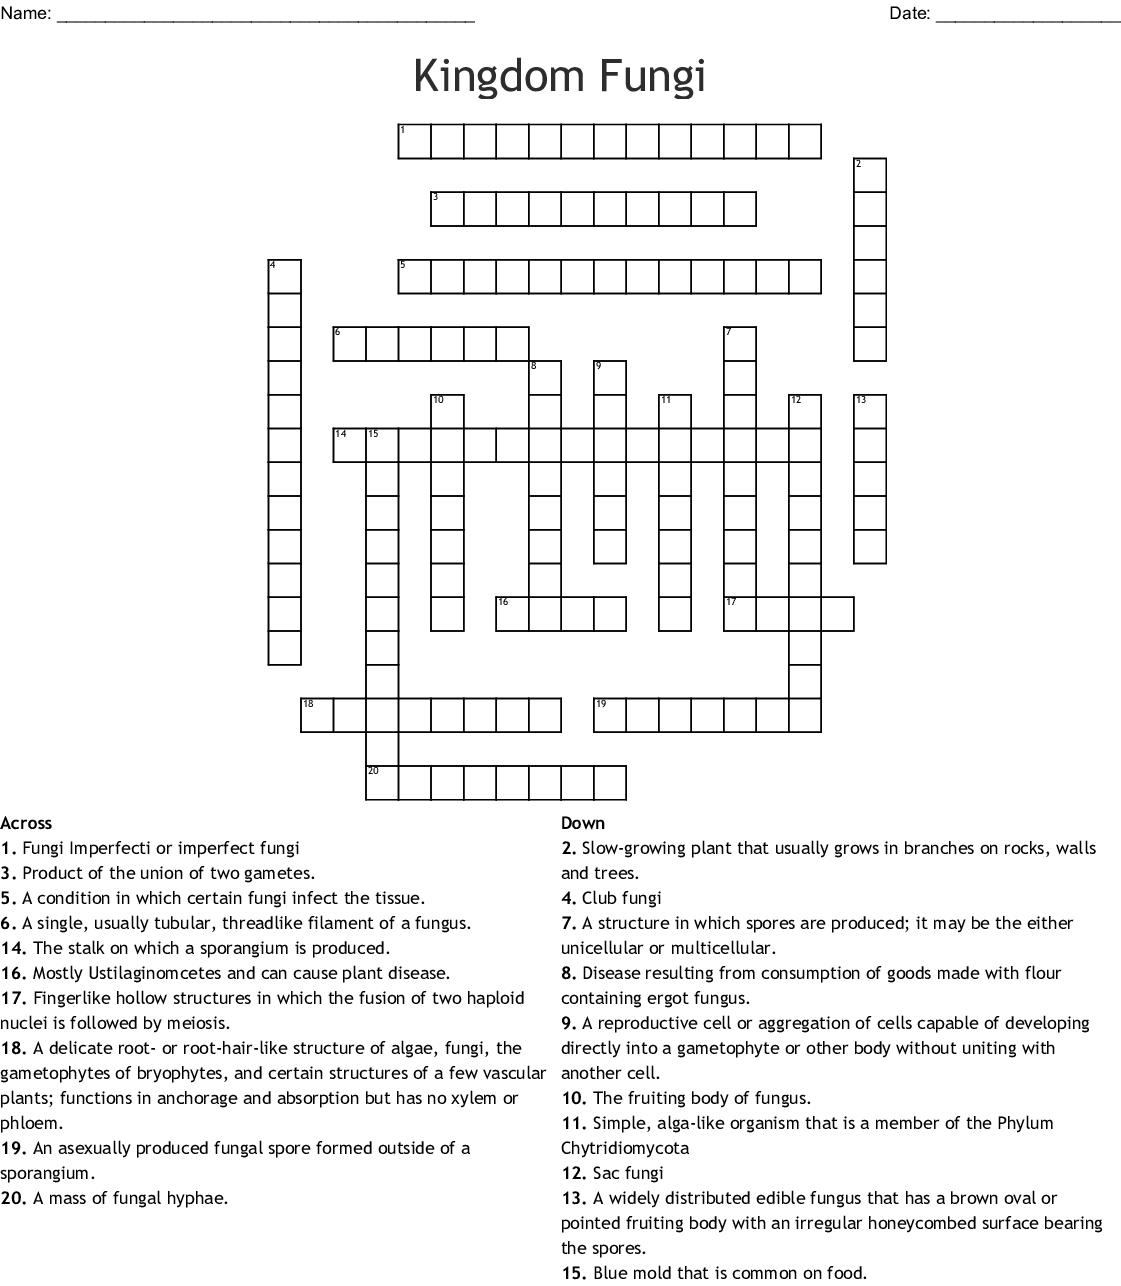 Kingdom Fungi Crossword